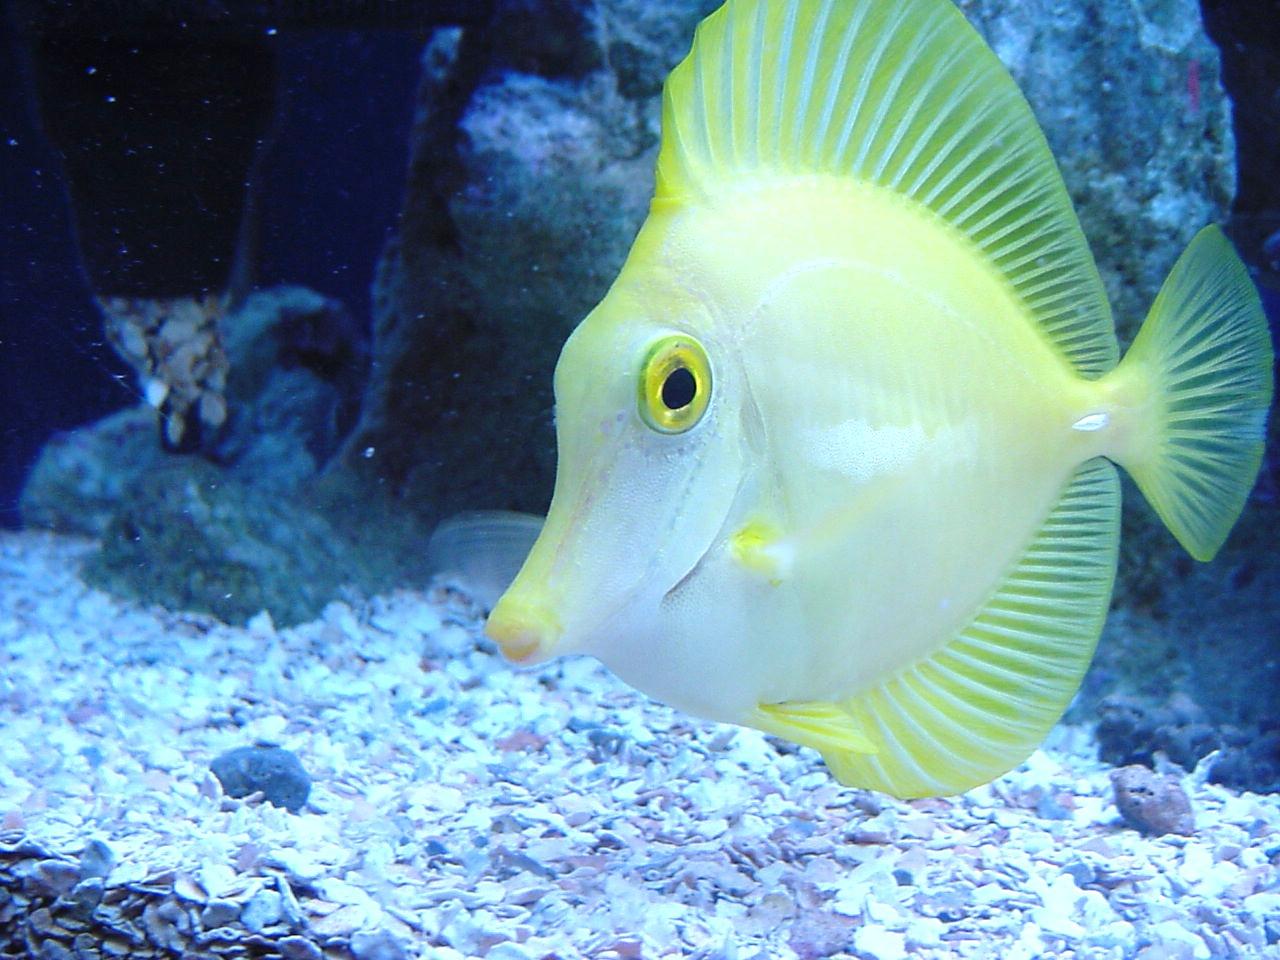 http://3.bp.blogspot.com/-bben4hnaxUY/TZVJ_PYhmpI/AAAAAAAABDI/wayPr8I_yIg/s1600/yellow-fish.jpg